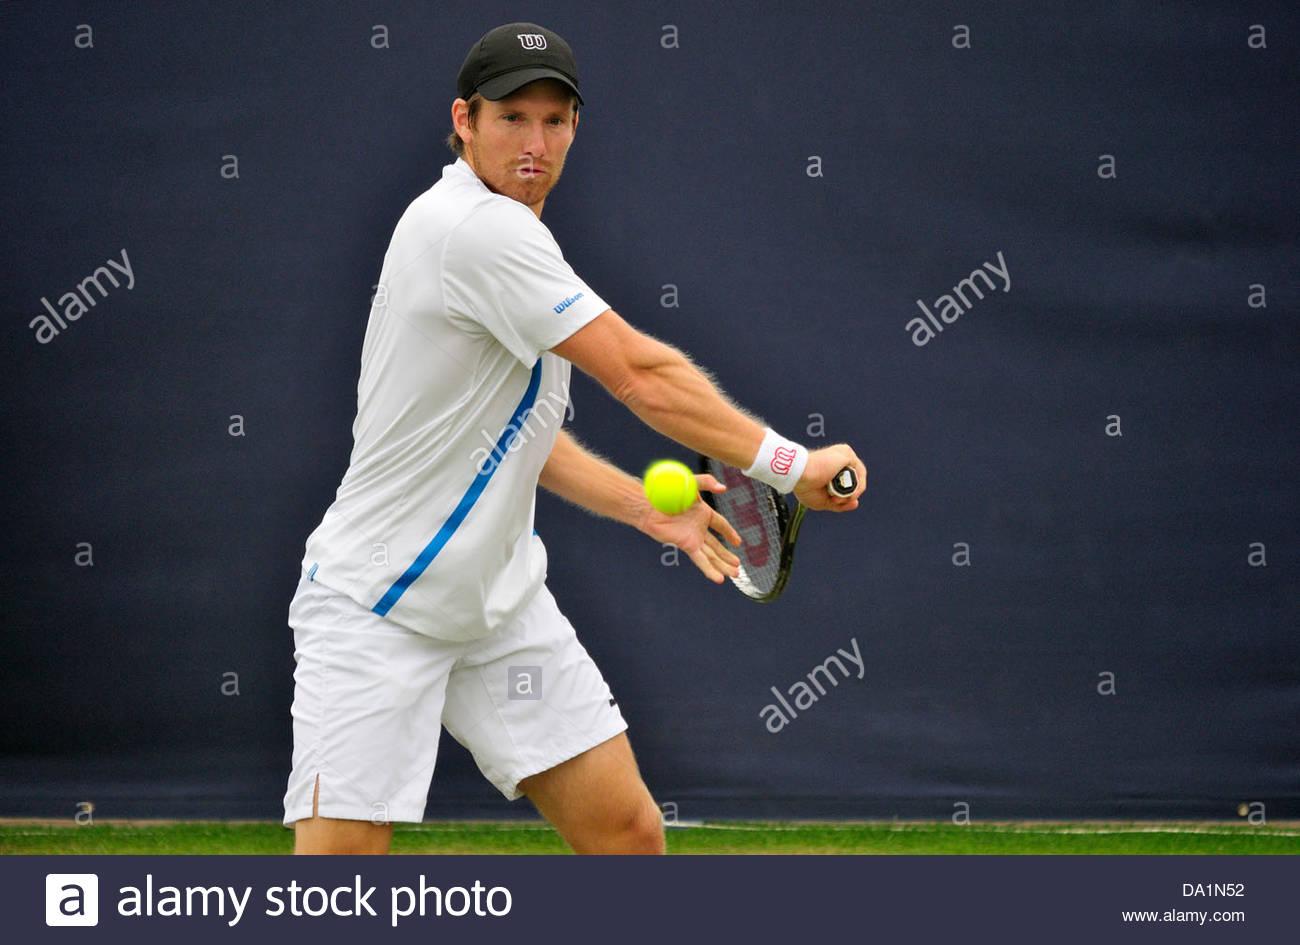 Alexander Peya (Austria) playing a backhand at Eastbourne, 2013 - Stock Image